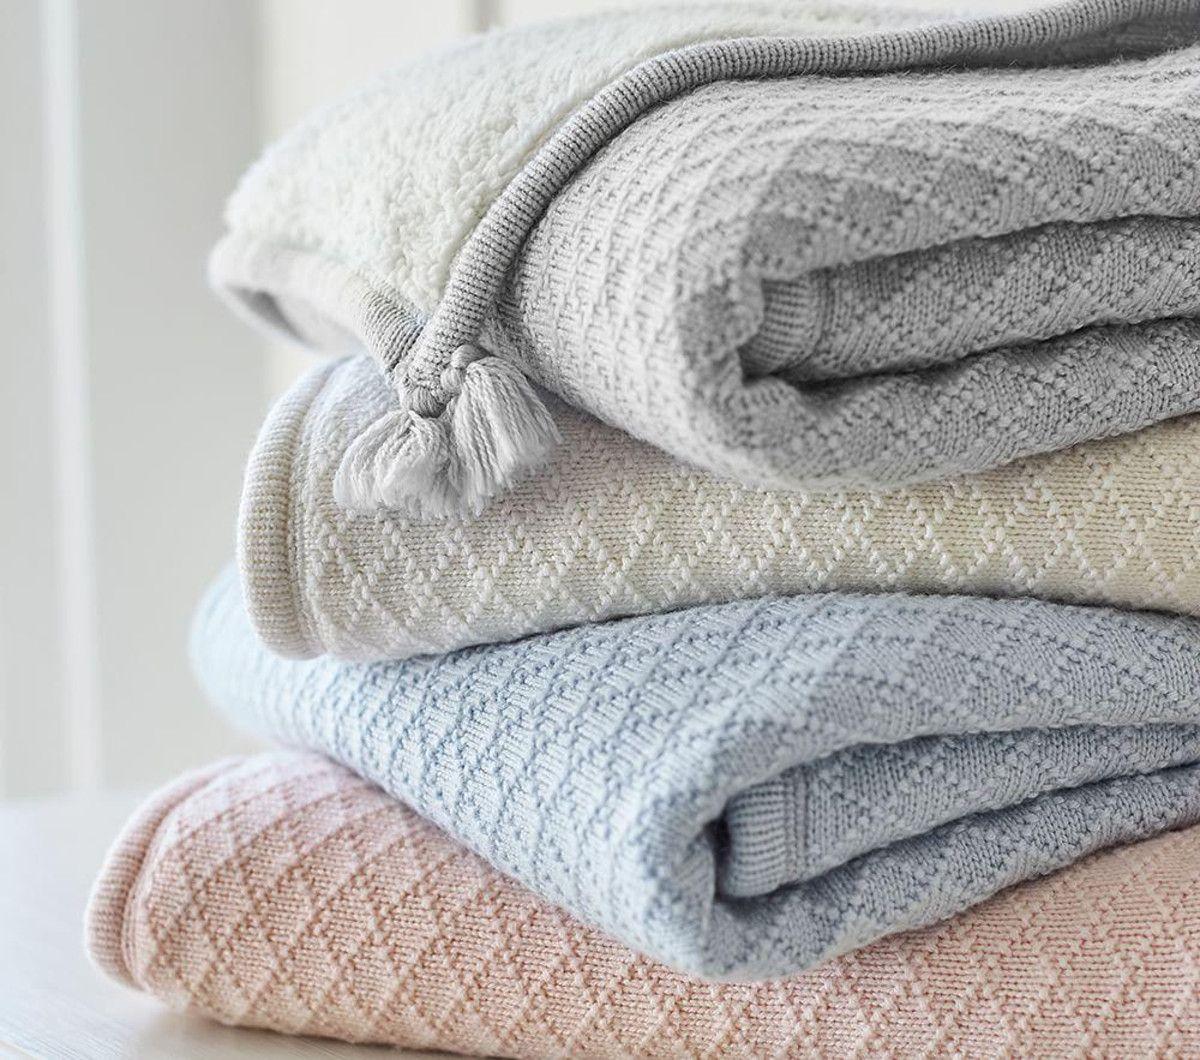 Luxe Knit Sherpa Baby Blanket Pottery barn baby blanket